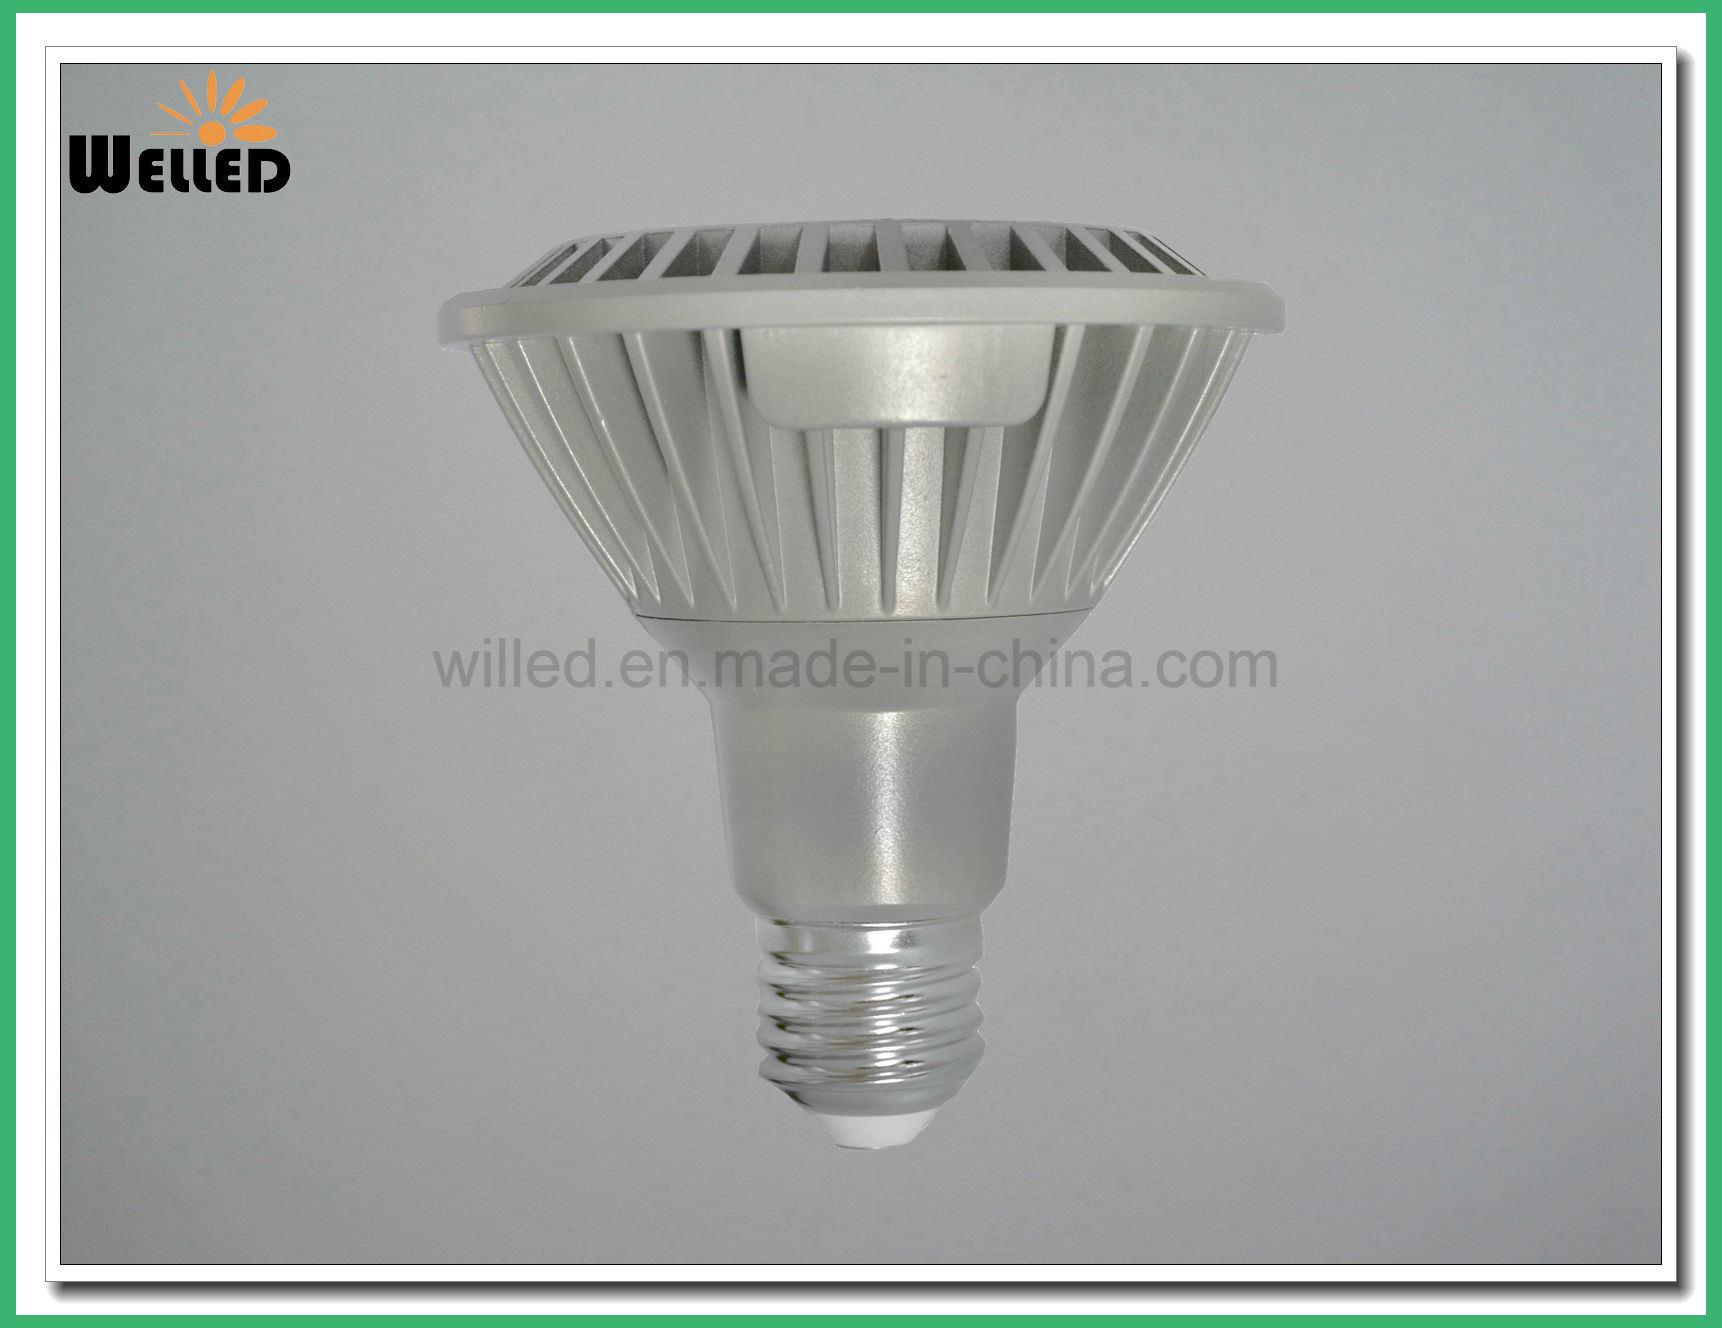 13W LED PAR30 Spot Light E27 with Aluminum and High Brightness Bulb Lamp